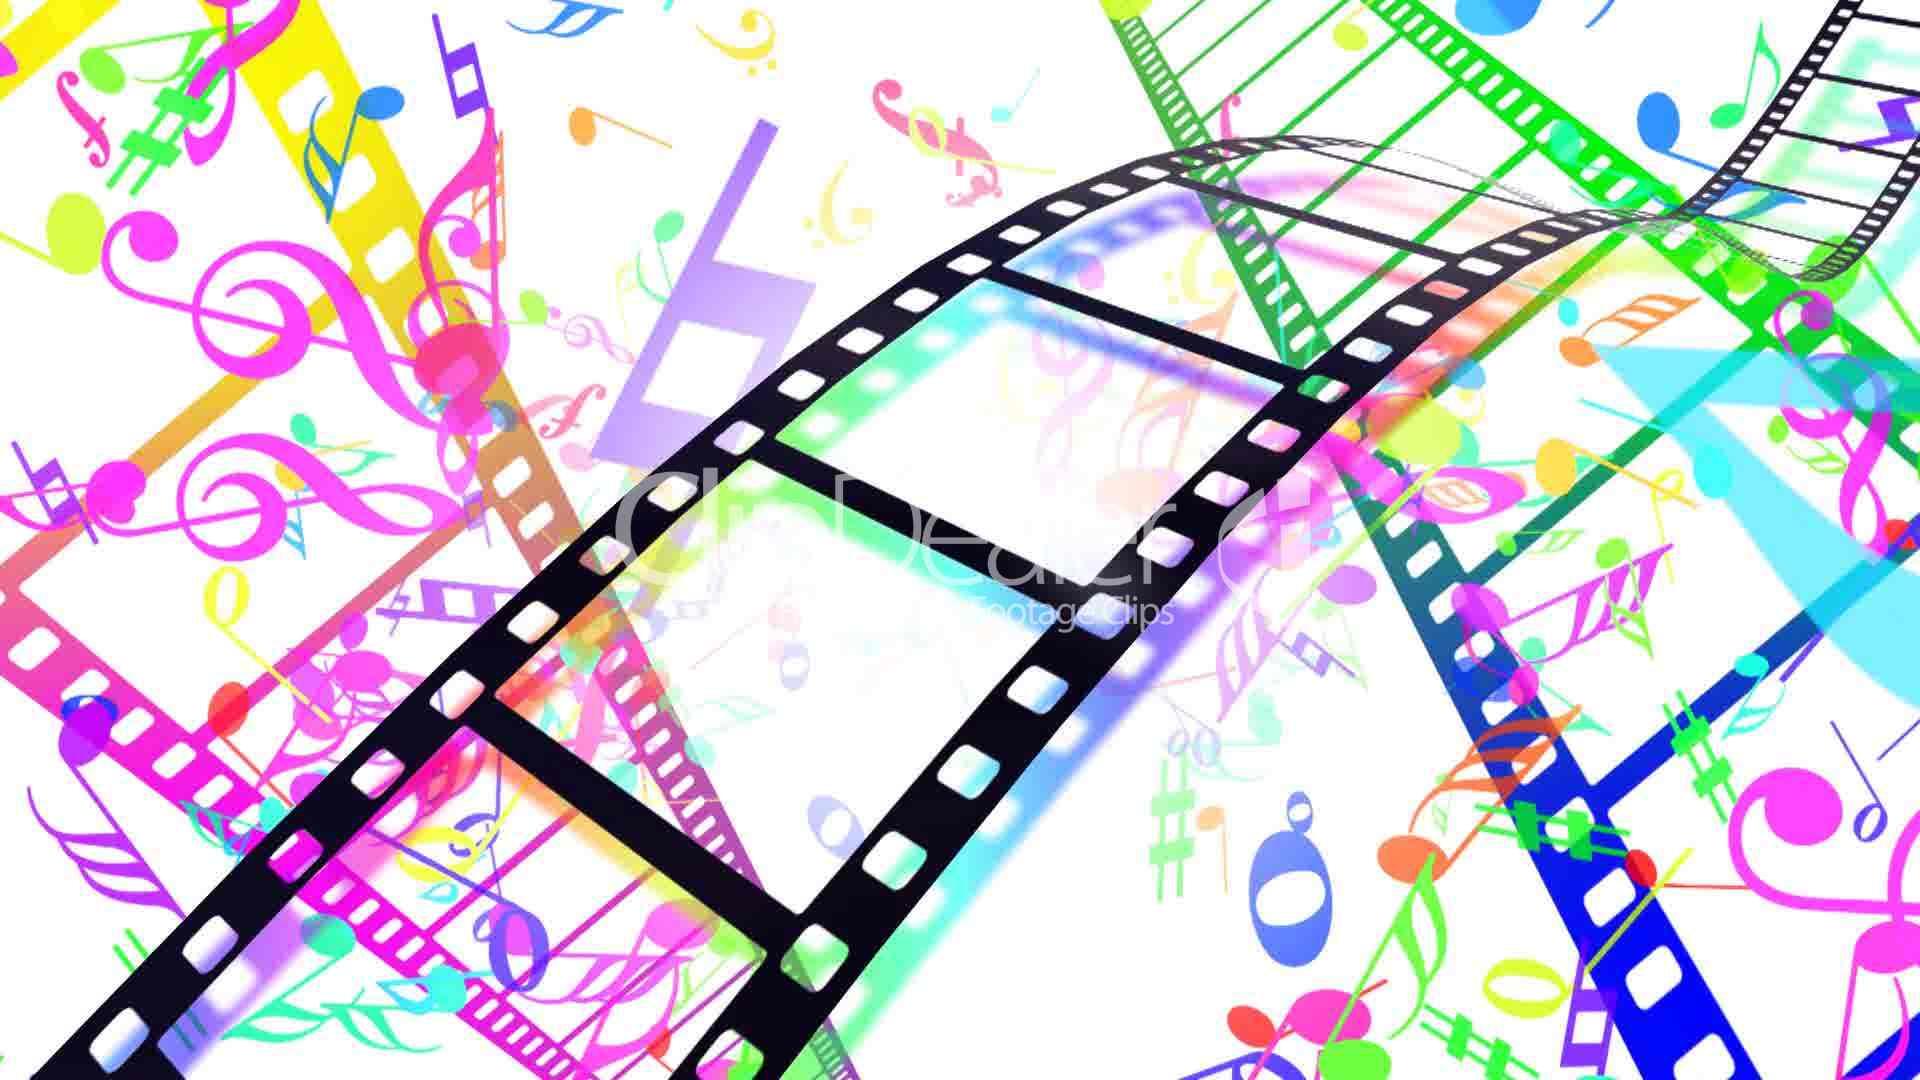 10--519495-Music_Film_Bc1-1502265185.jpg